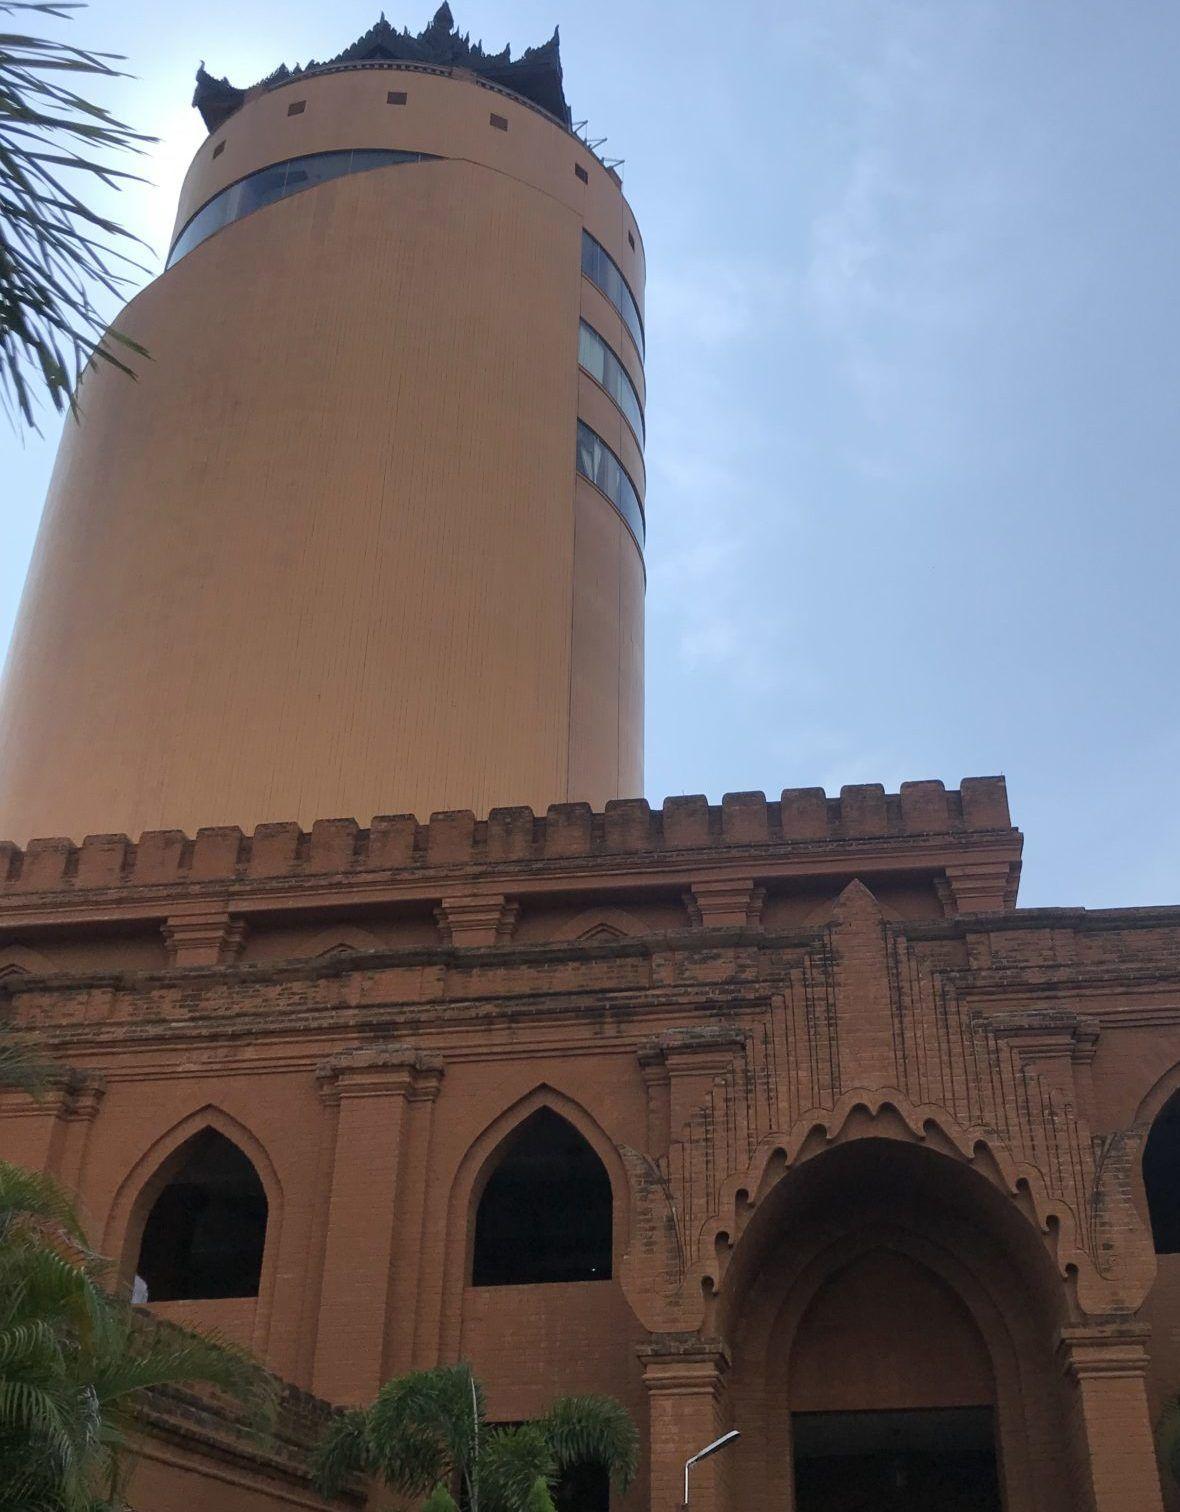 Nann Mynt Tower